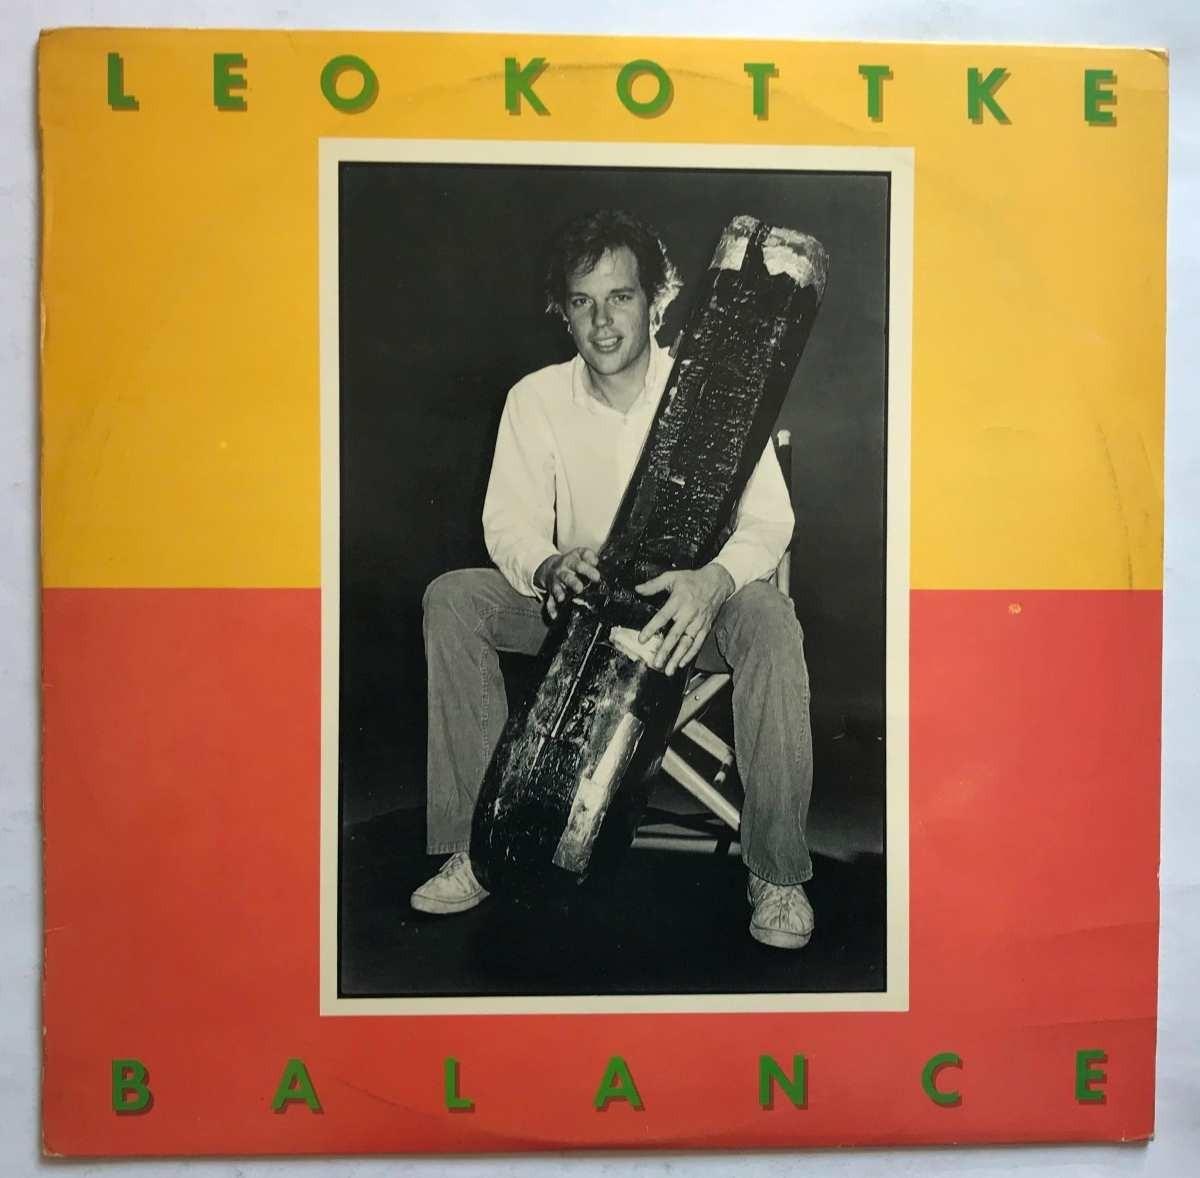 Kottke Leo - Balance